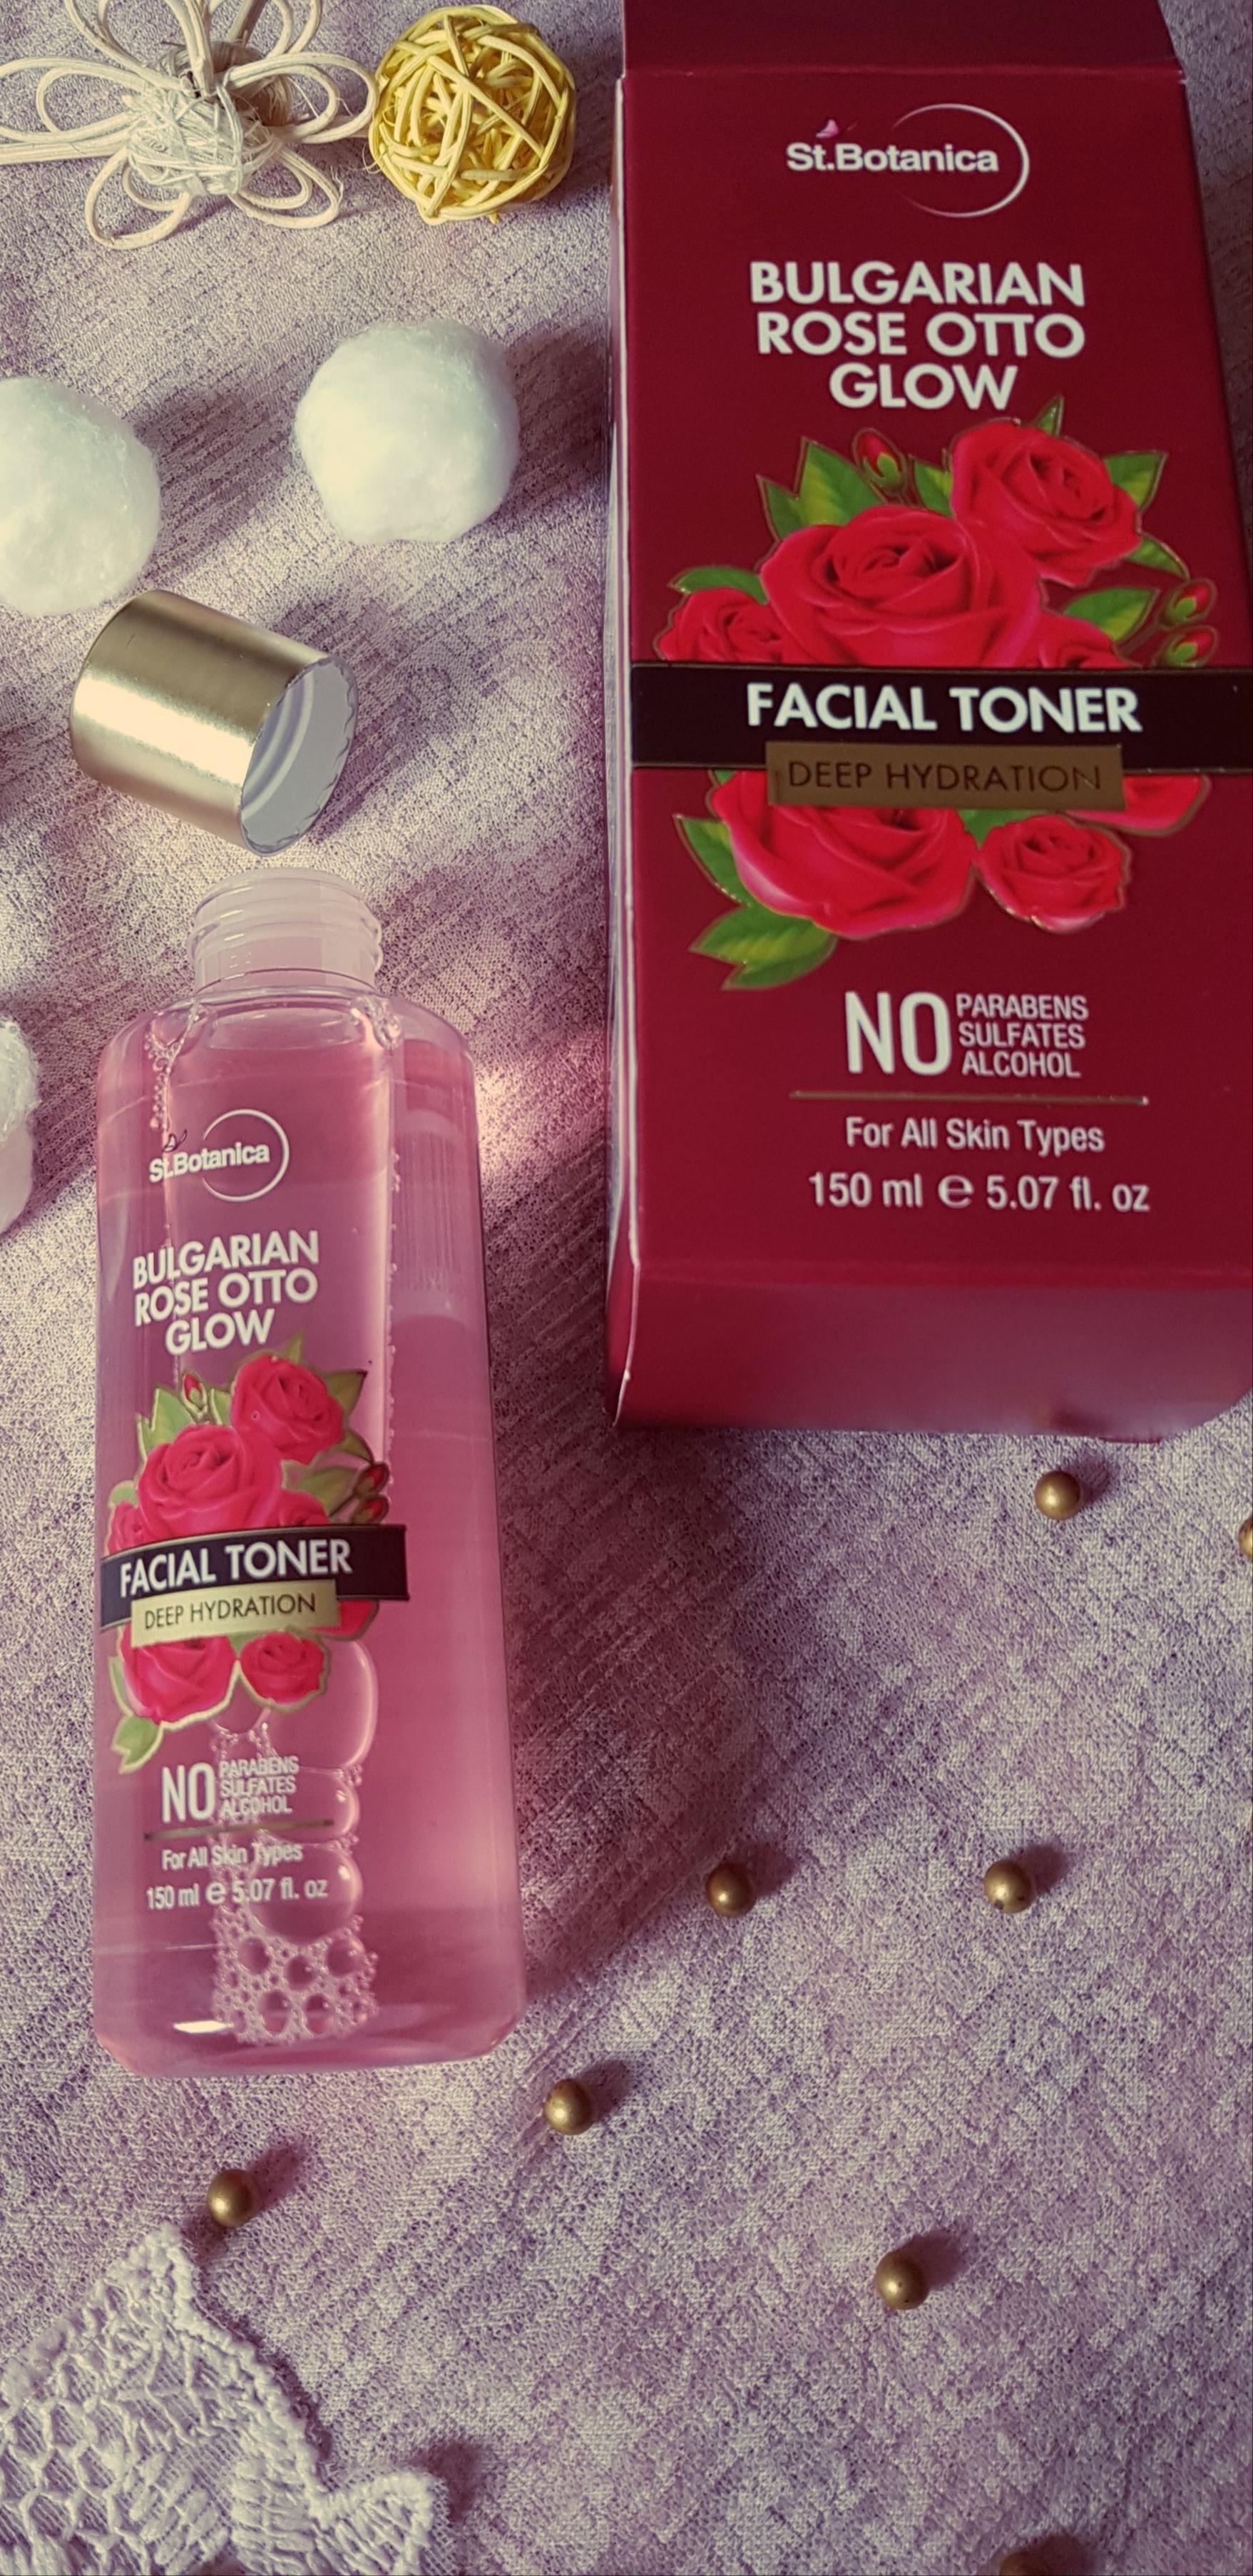 StBotanica Bulgarian Rose Otto Glow Deep Hydration Facial Toner-Amazing rose fragrance!-By mizbha378